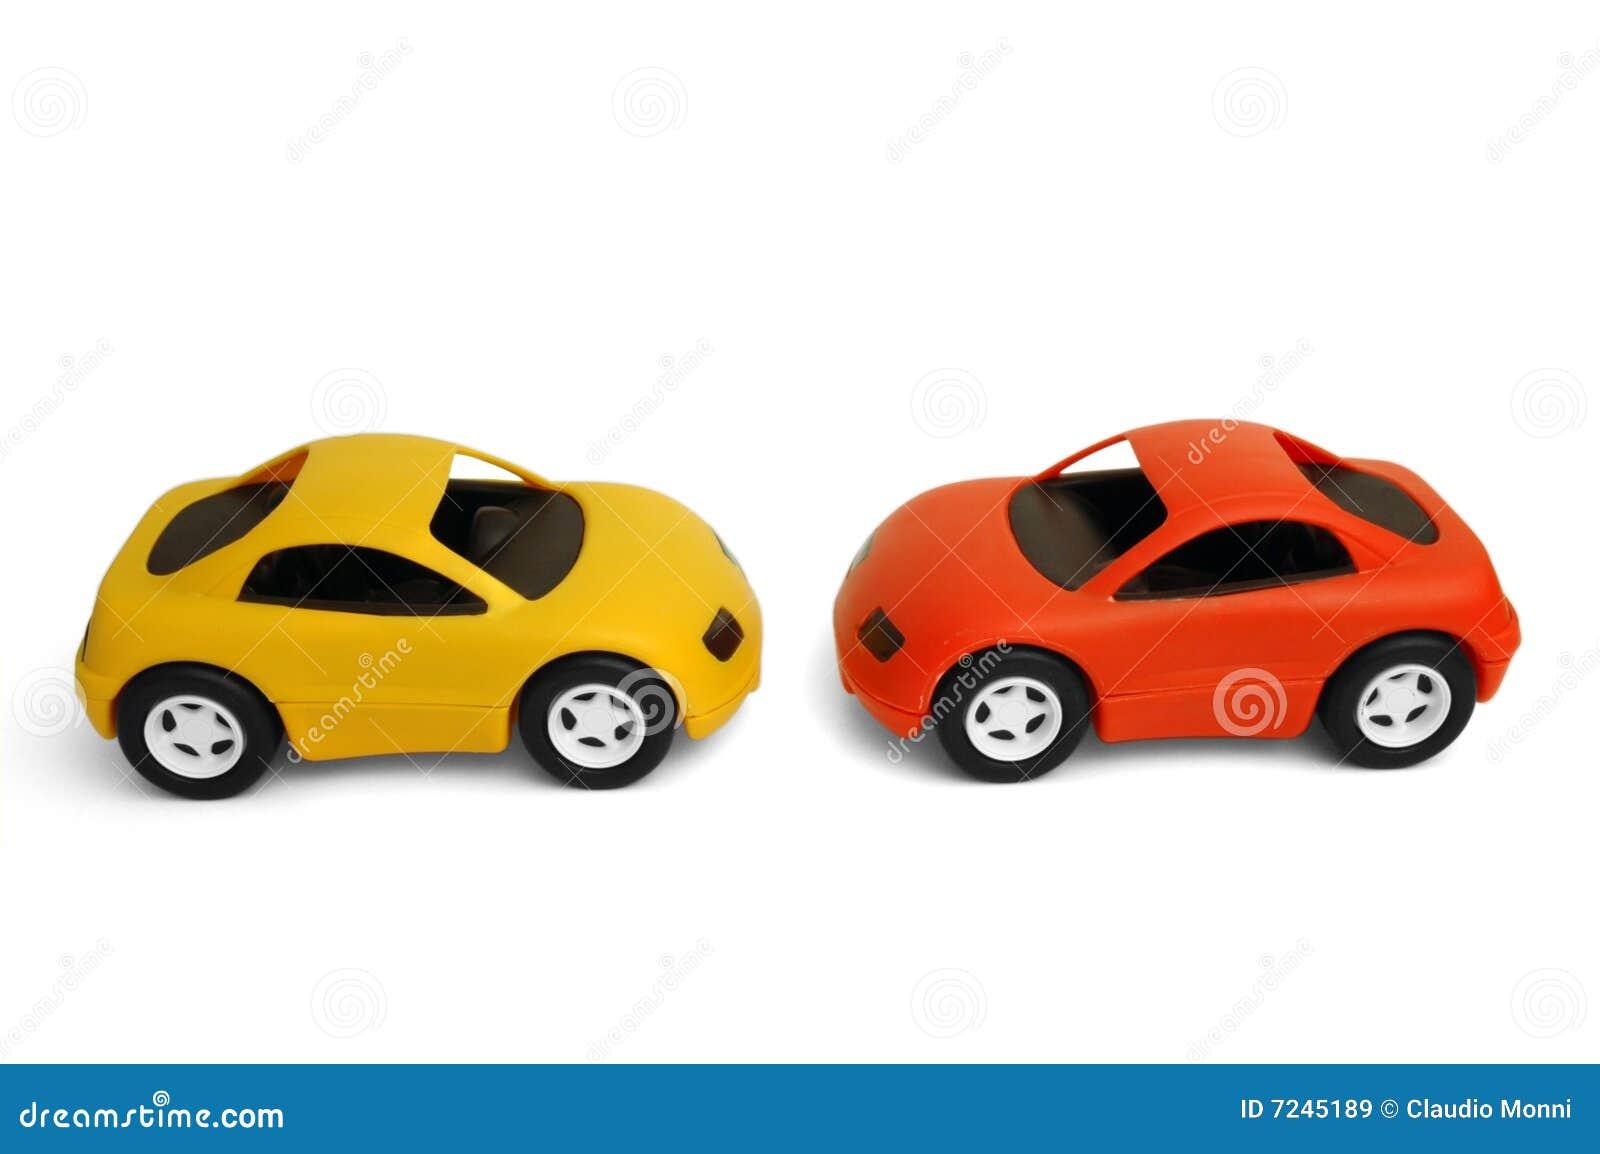 Spielzeug autos lizenzfreie stockbilder bild